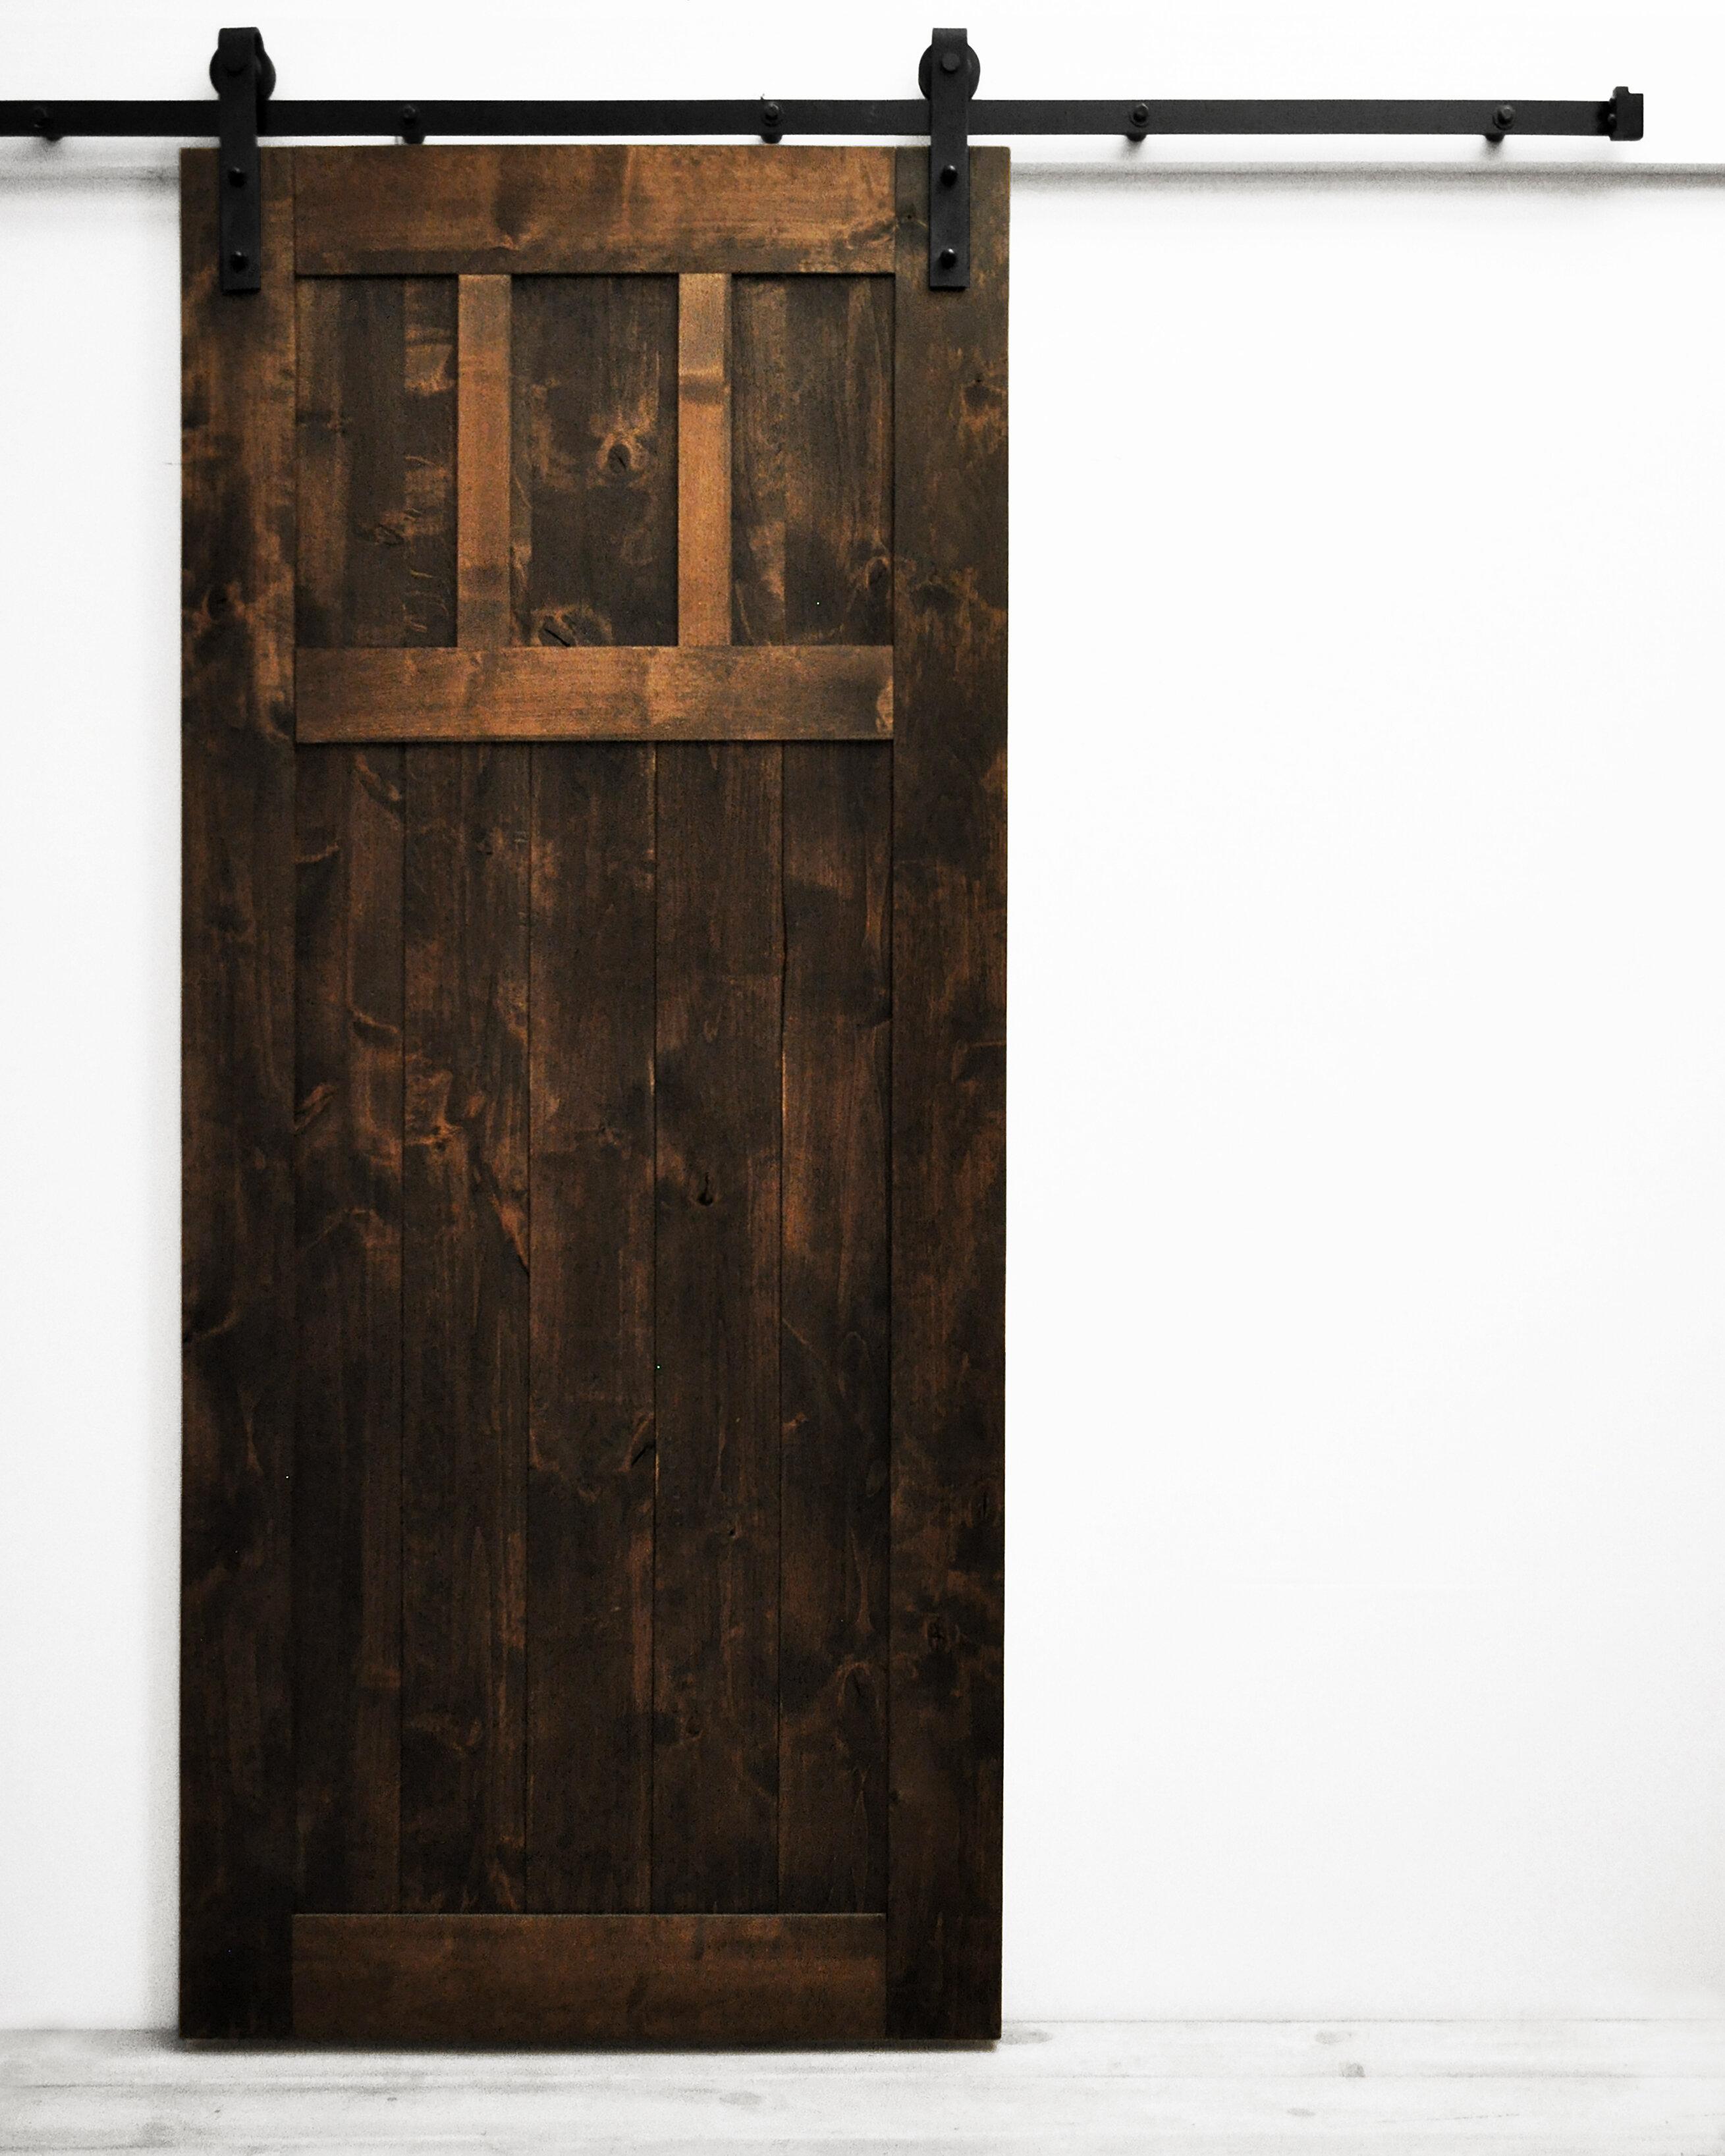 Dogberry Collections Craftsman Solid Wood Room Dividers Knotty Alder Slab Interior Barn Door Wayfair